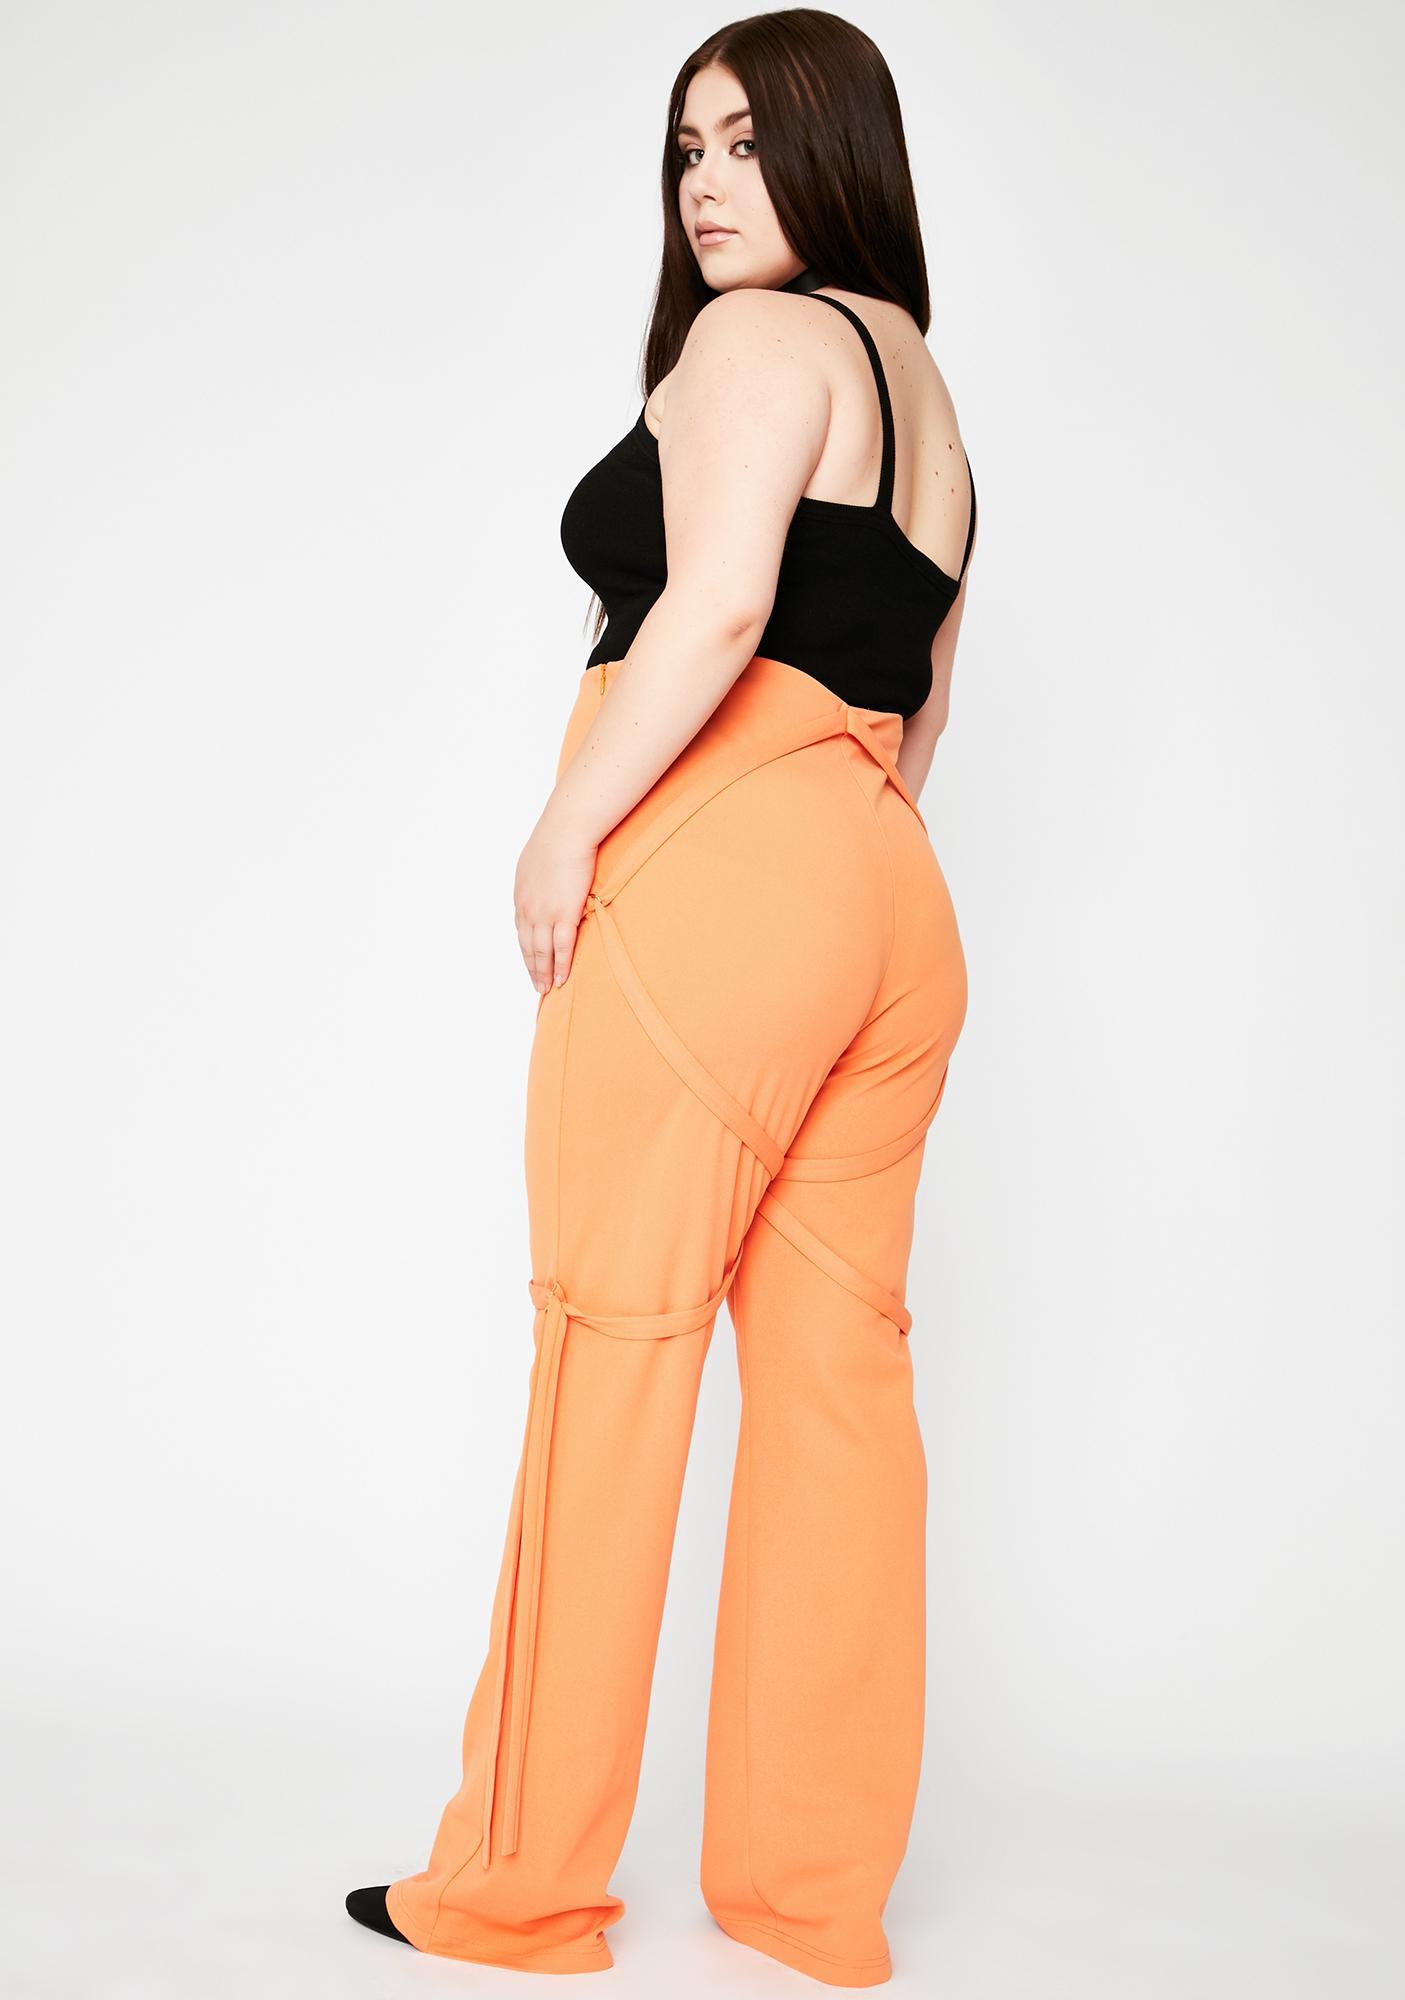 Tangerine Legit Undercover Heaux High Waisted Pants